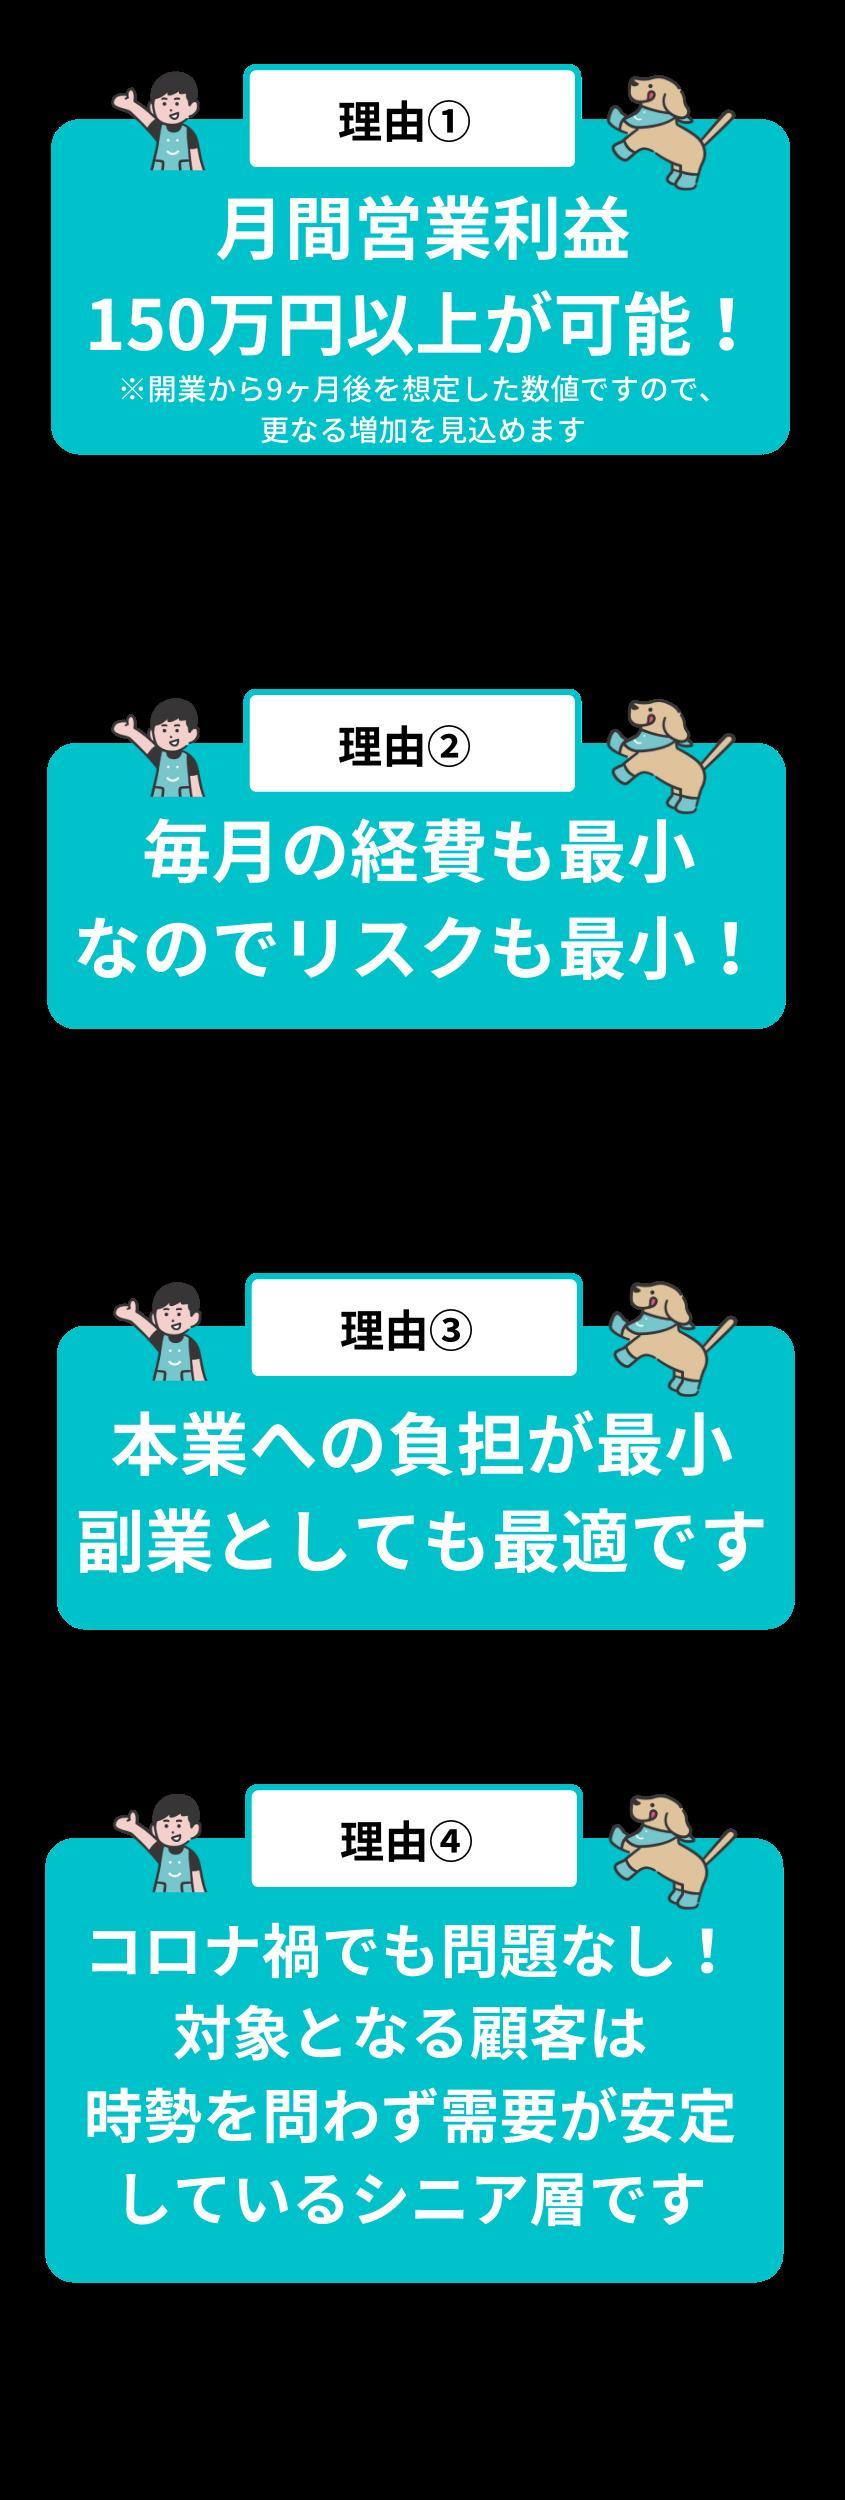 差込画像02_LP0609 (2)